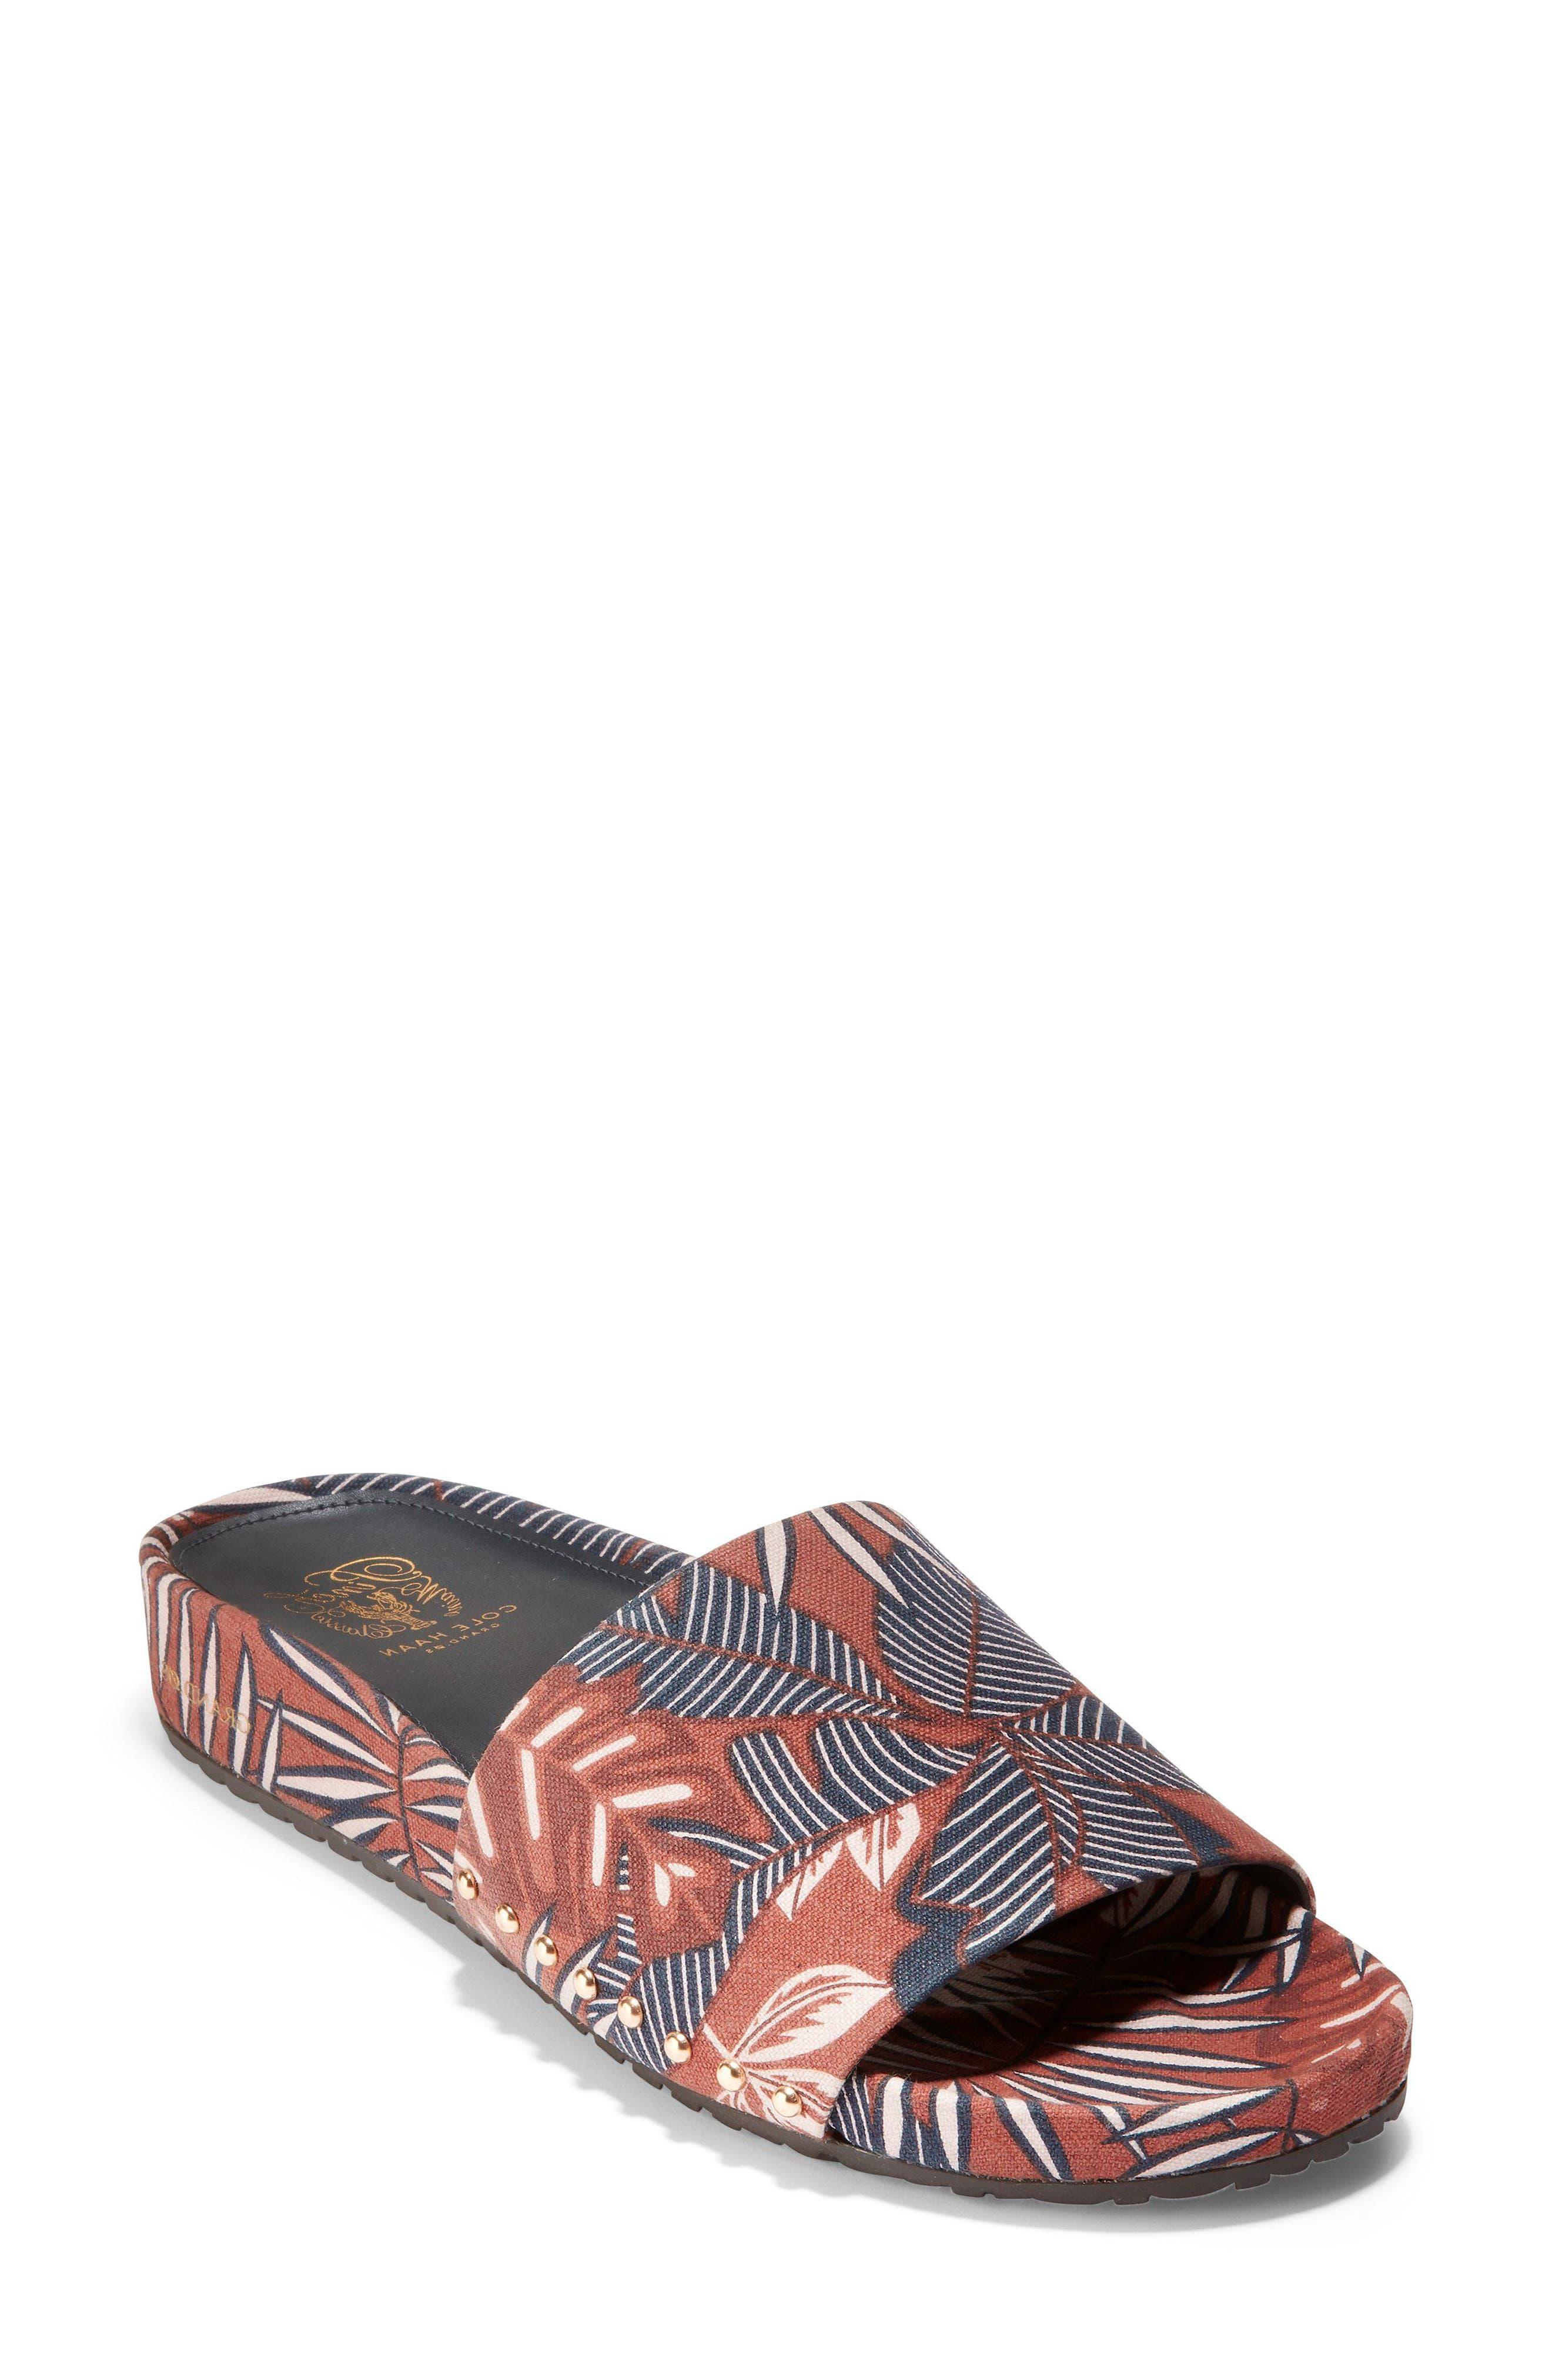 Pinch Montauk Print Slide Sandal,                         Main,                         color, 400